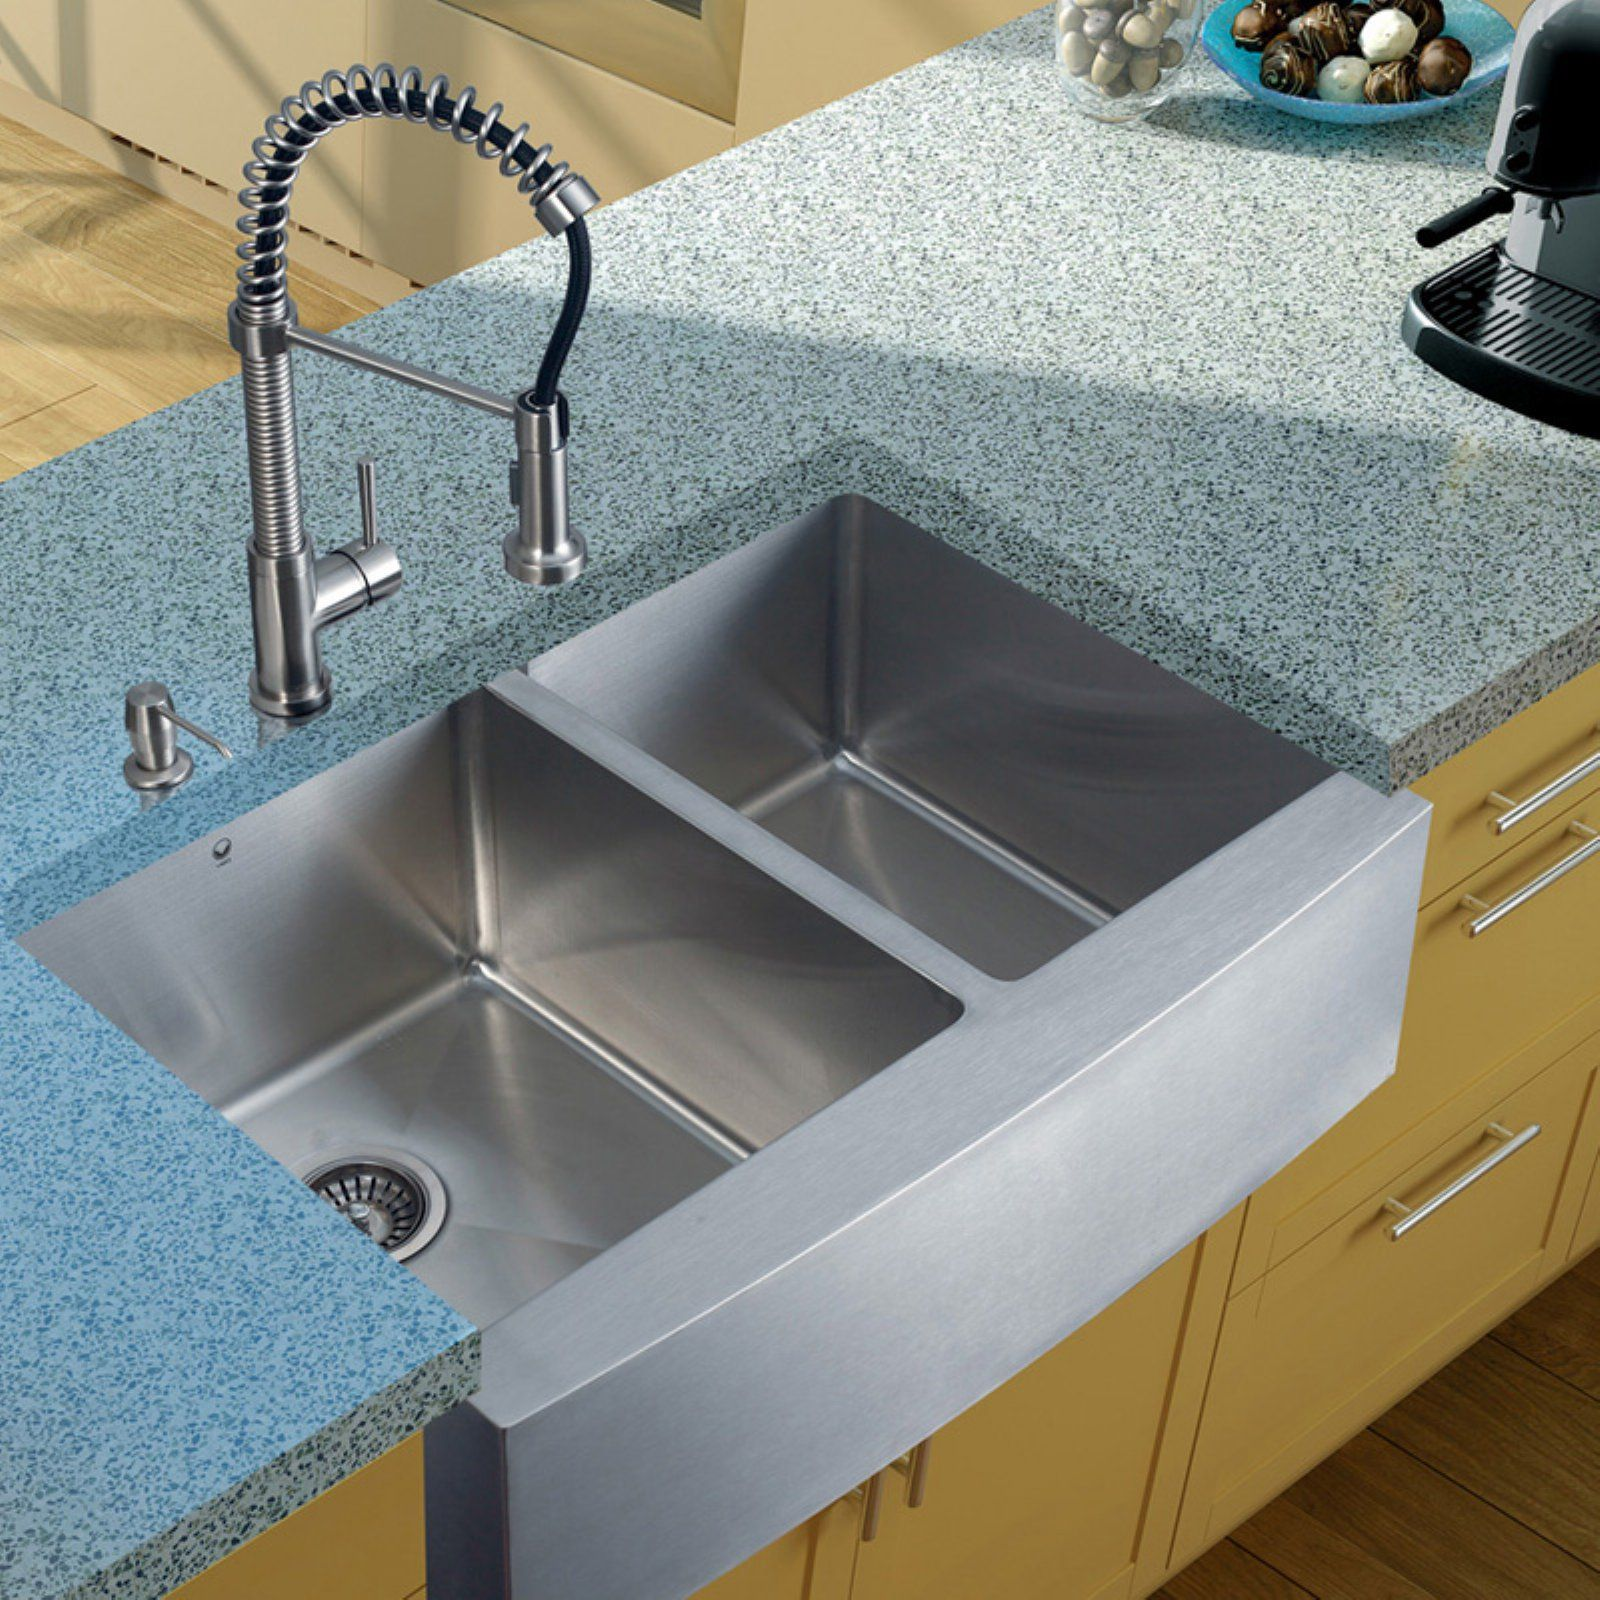 Vigo Vg15100 Double Basin Farmhouse Kitchen Sink And Faucet Set